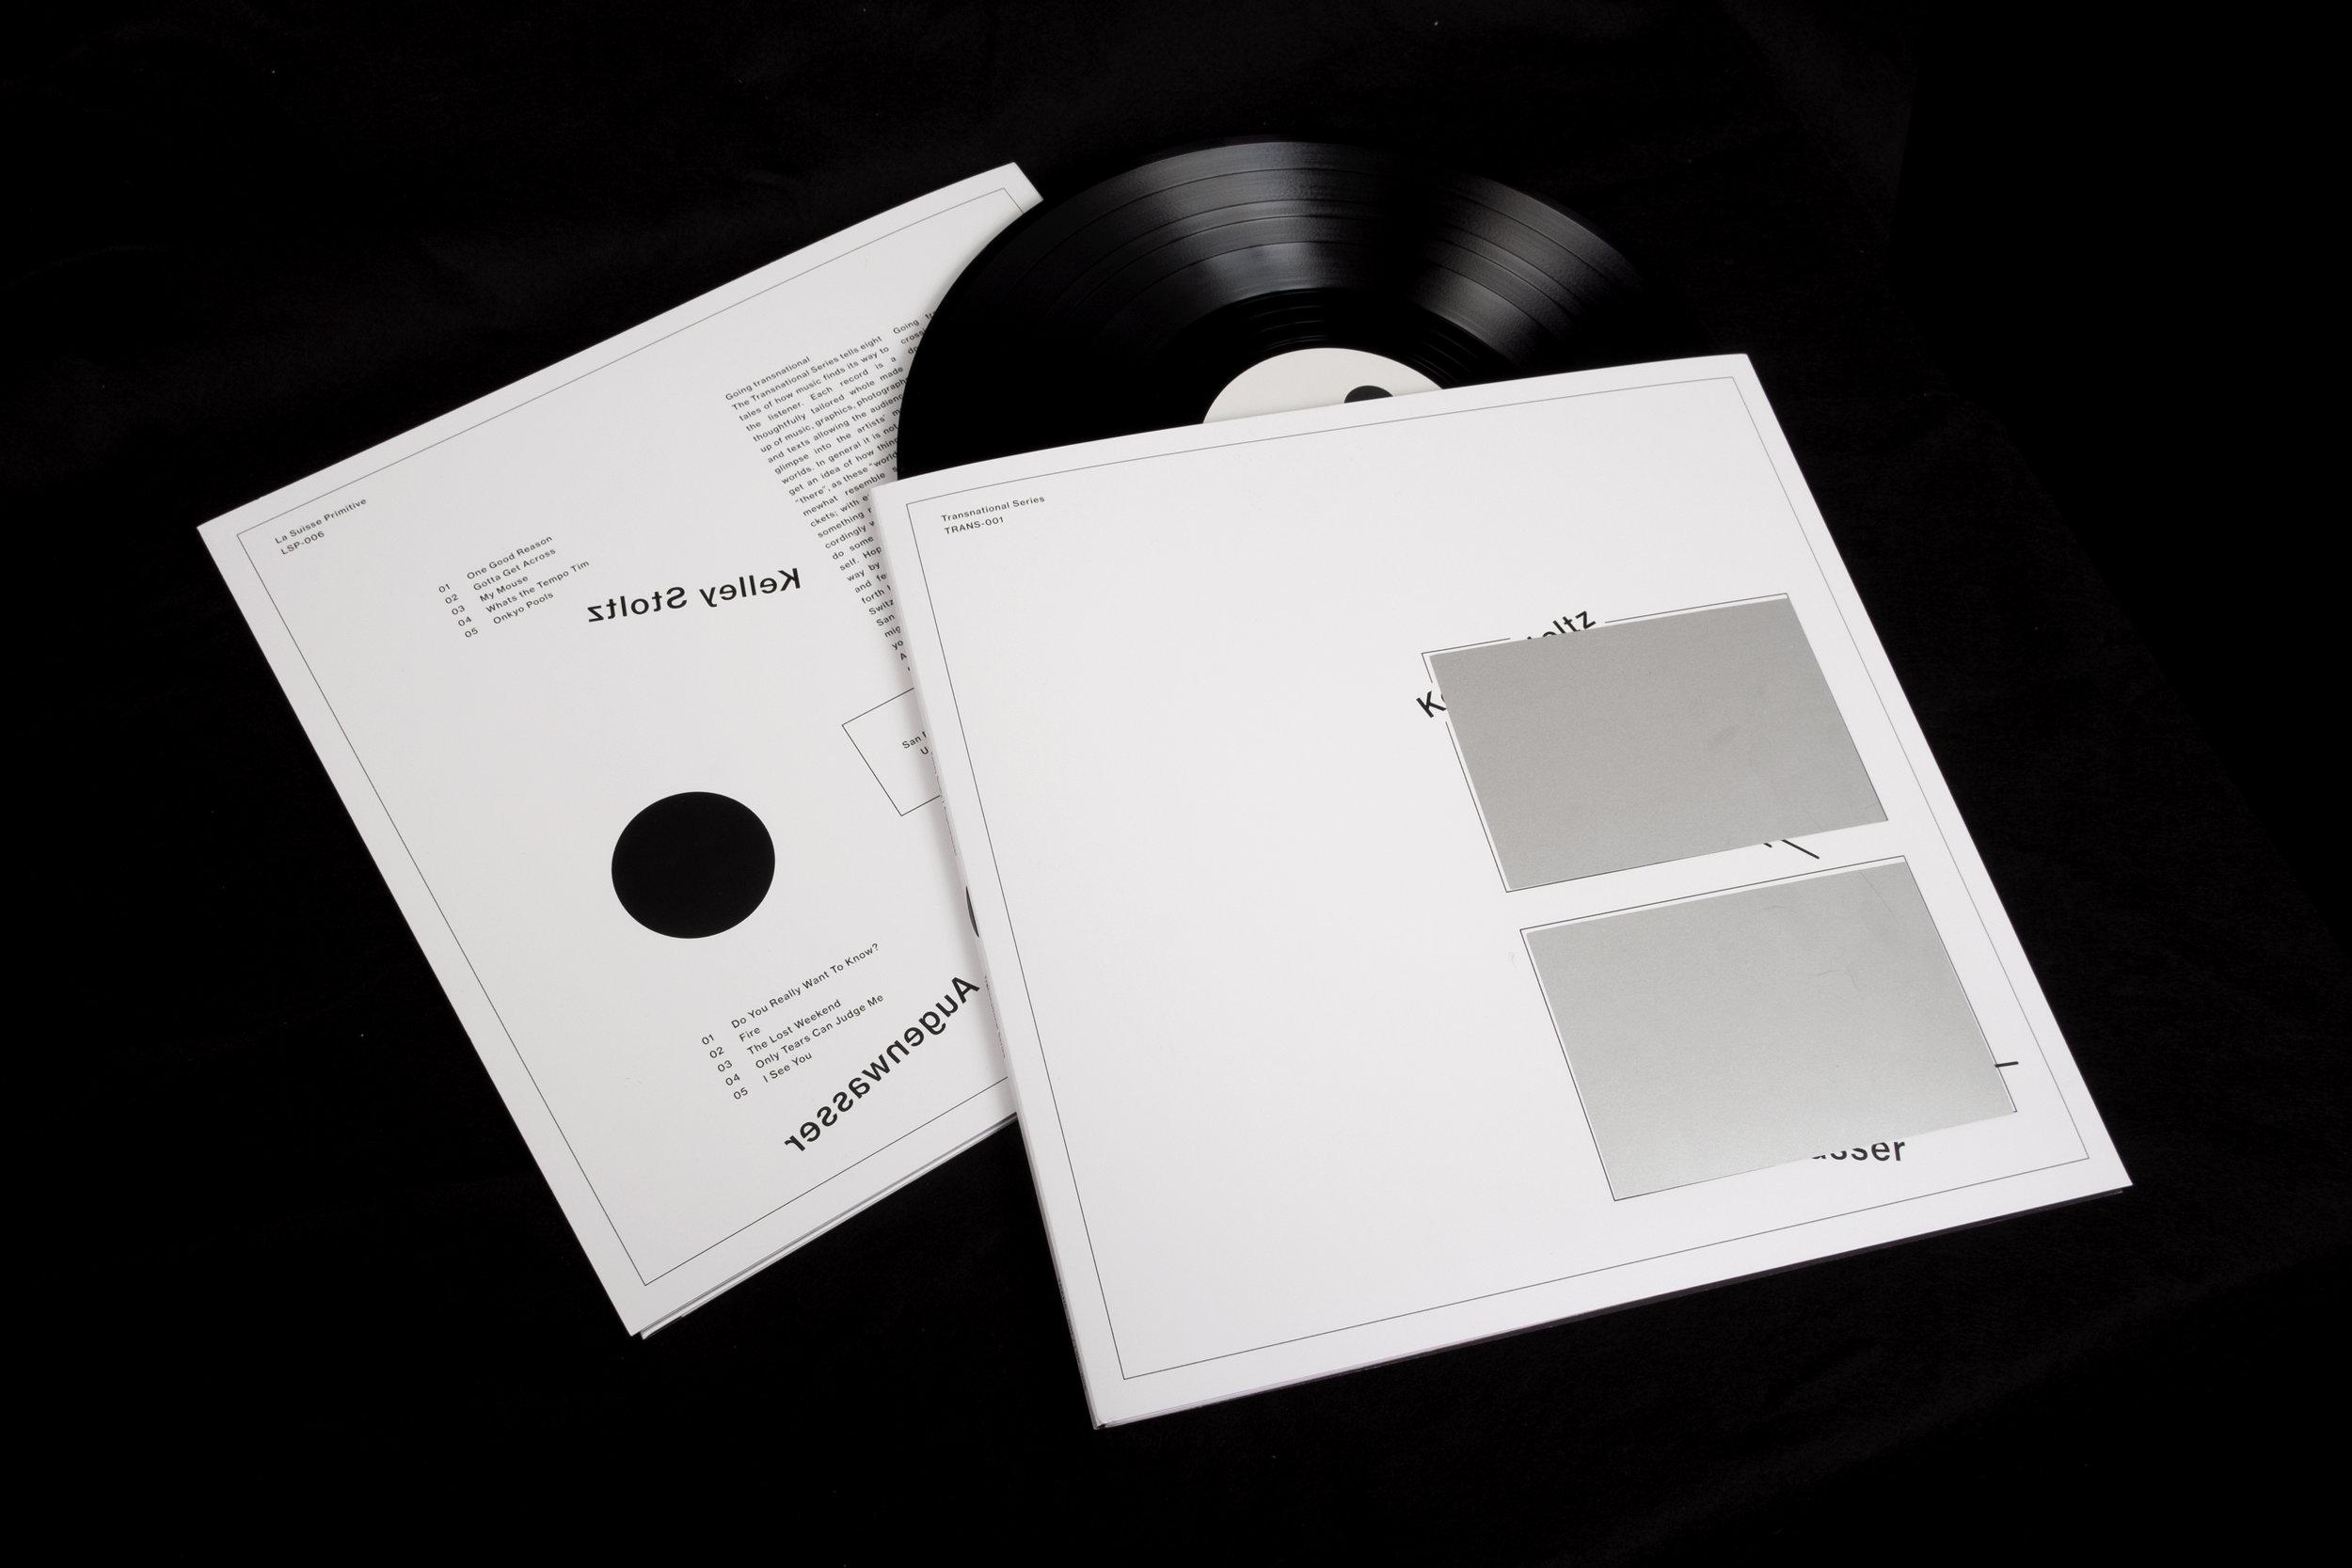 LSP-TRANS-001_record_01.jpg